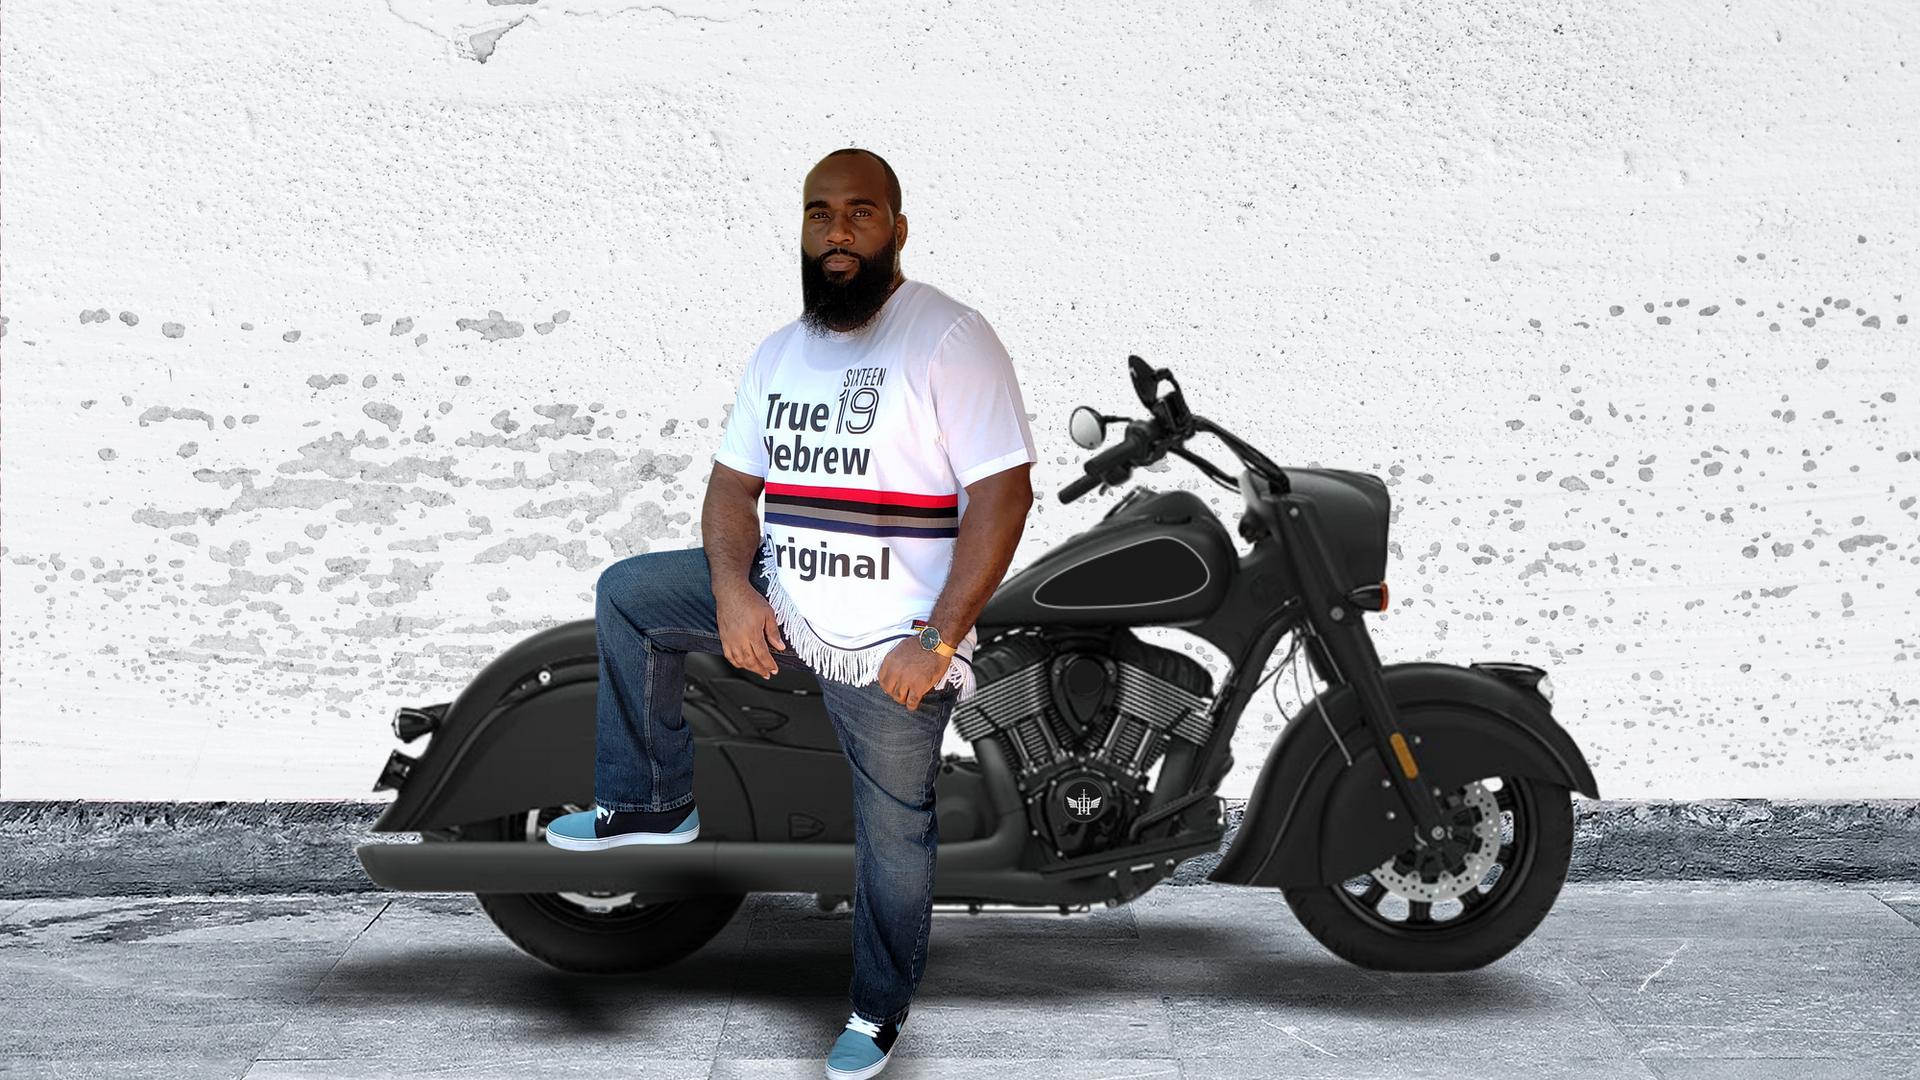 True Hebrew Model with Bike.png